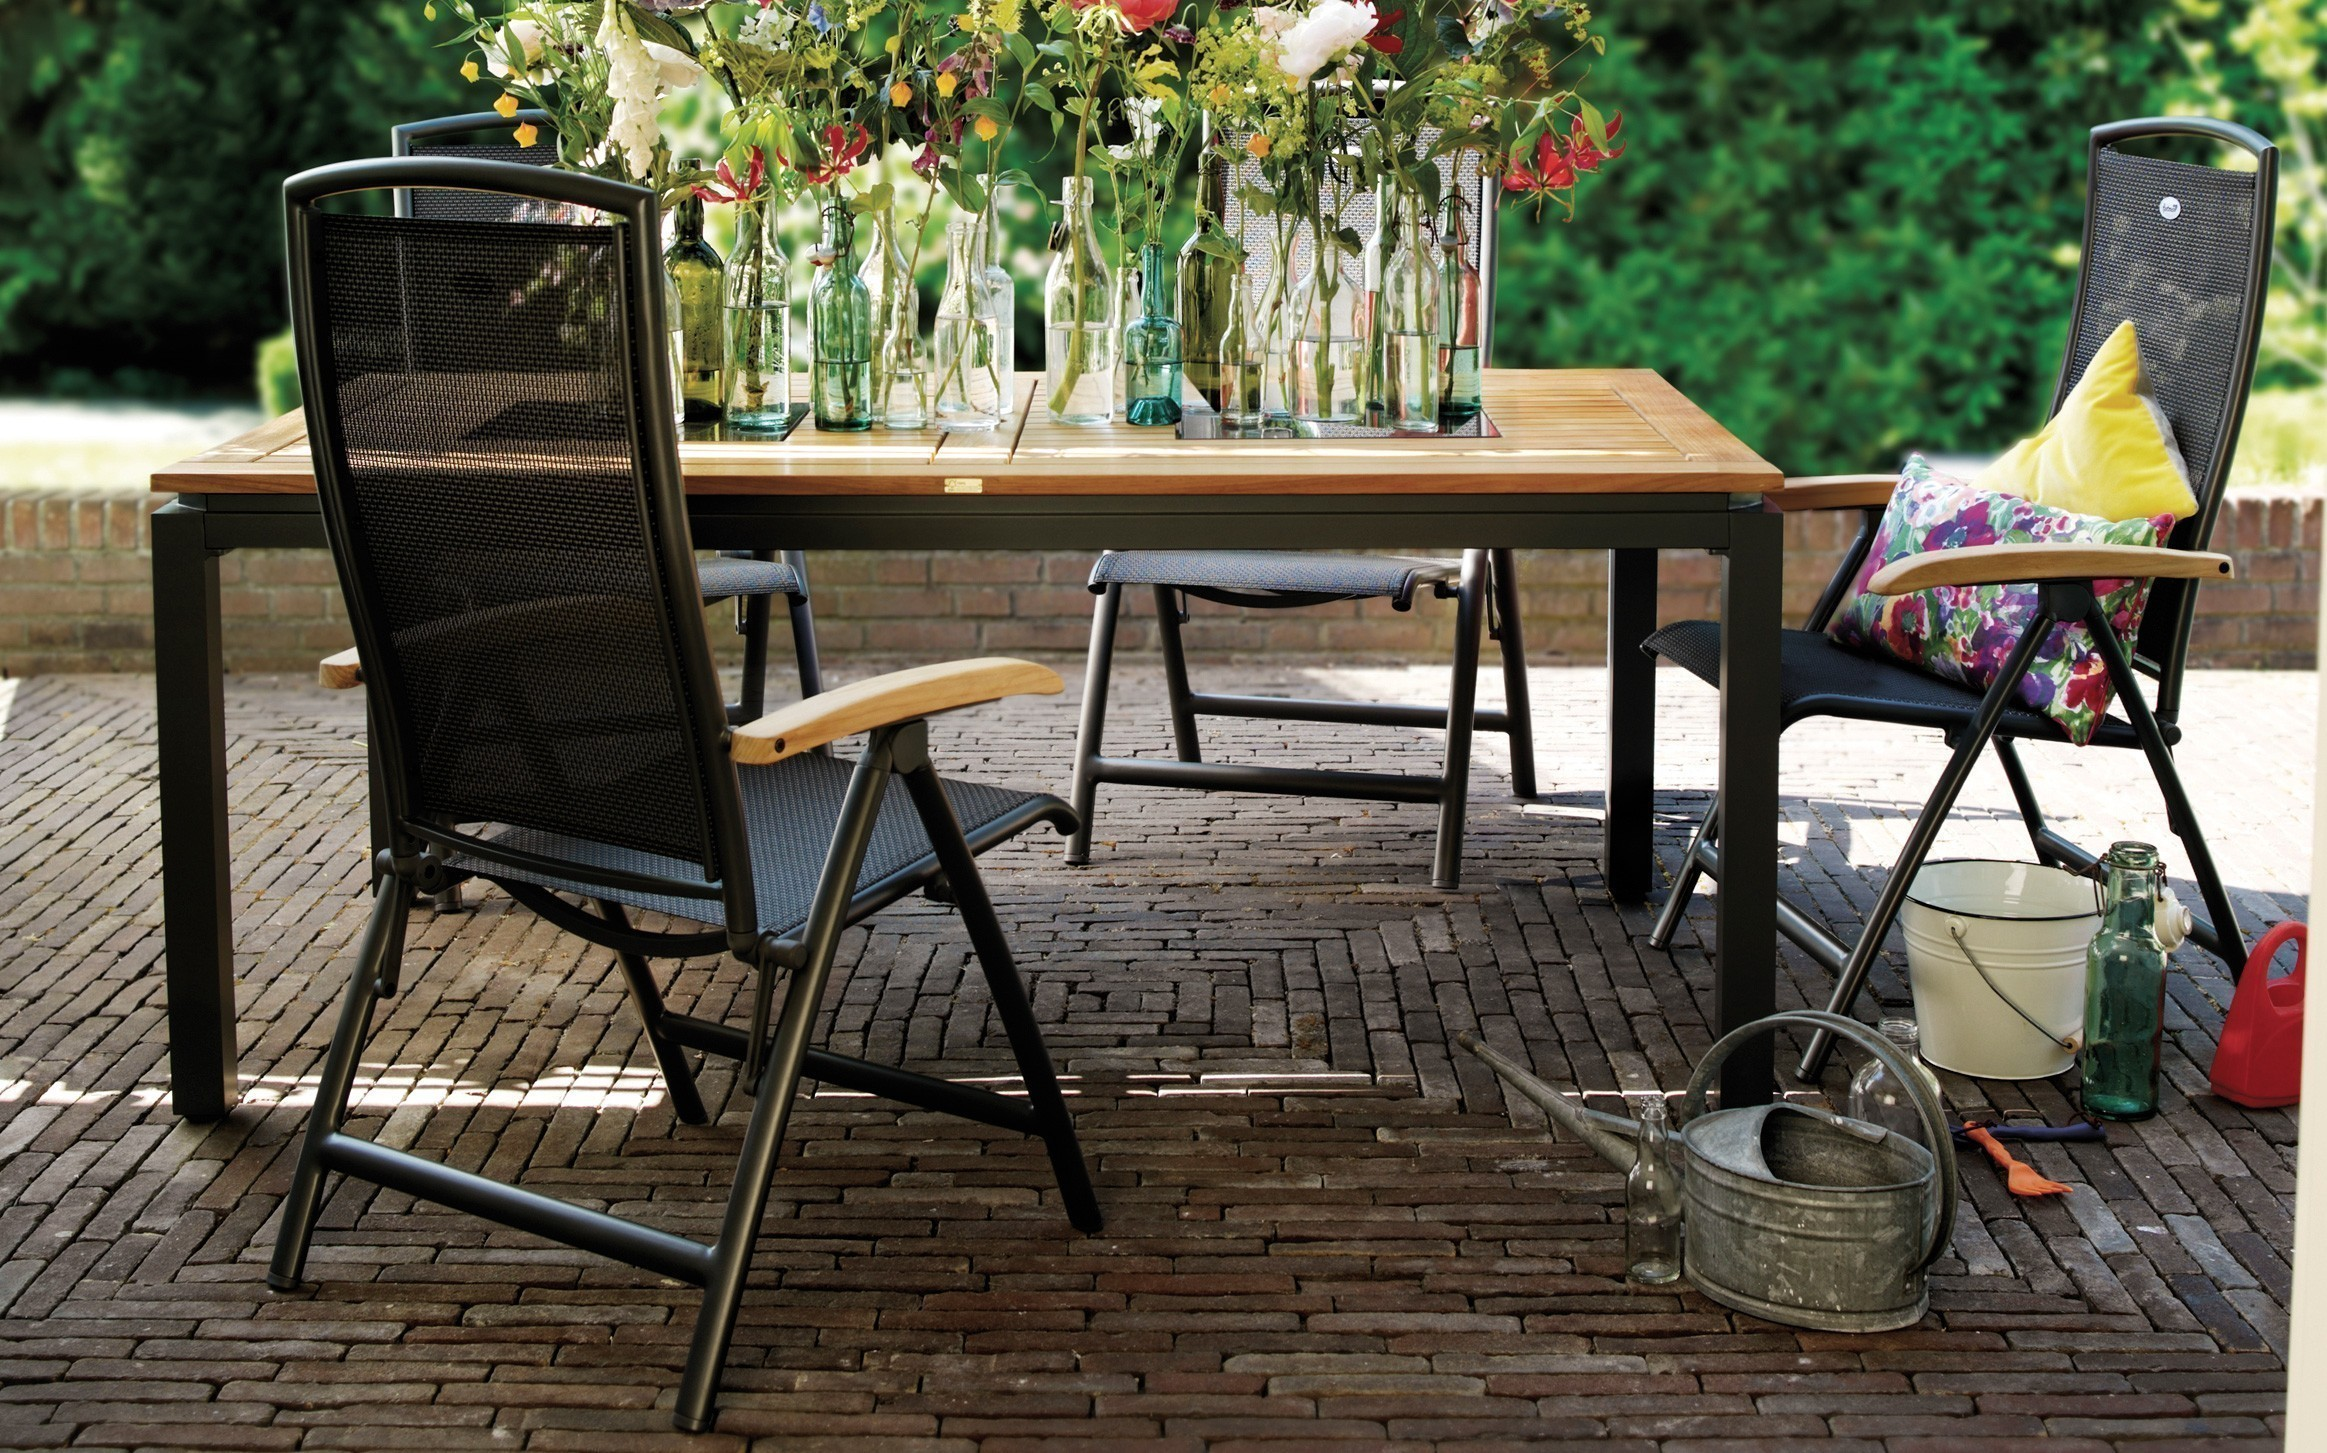 Design Gartenmobel Aus Kunststoff : Gartensessel  Gartenstuhl stapelbar Raffaello Hartman Alu anthrazit [R